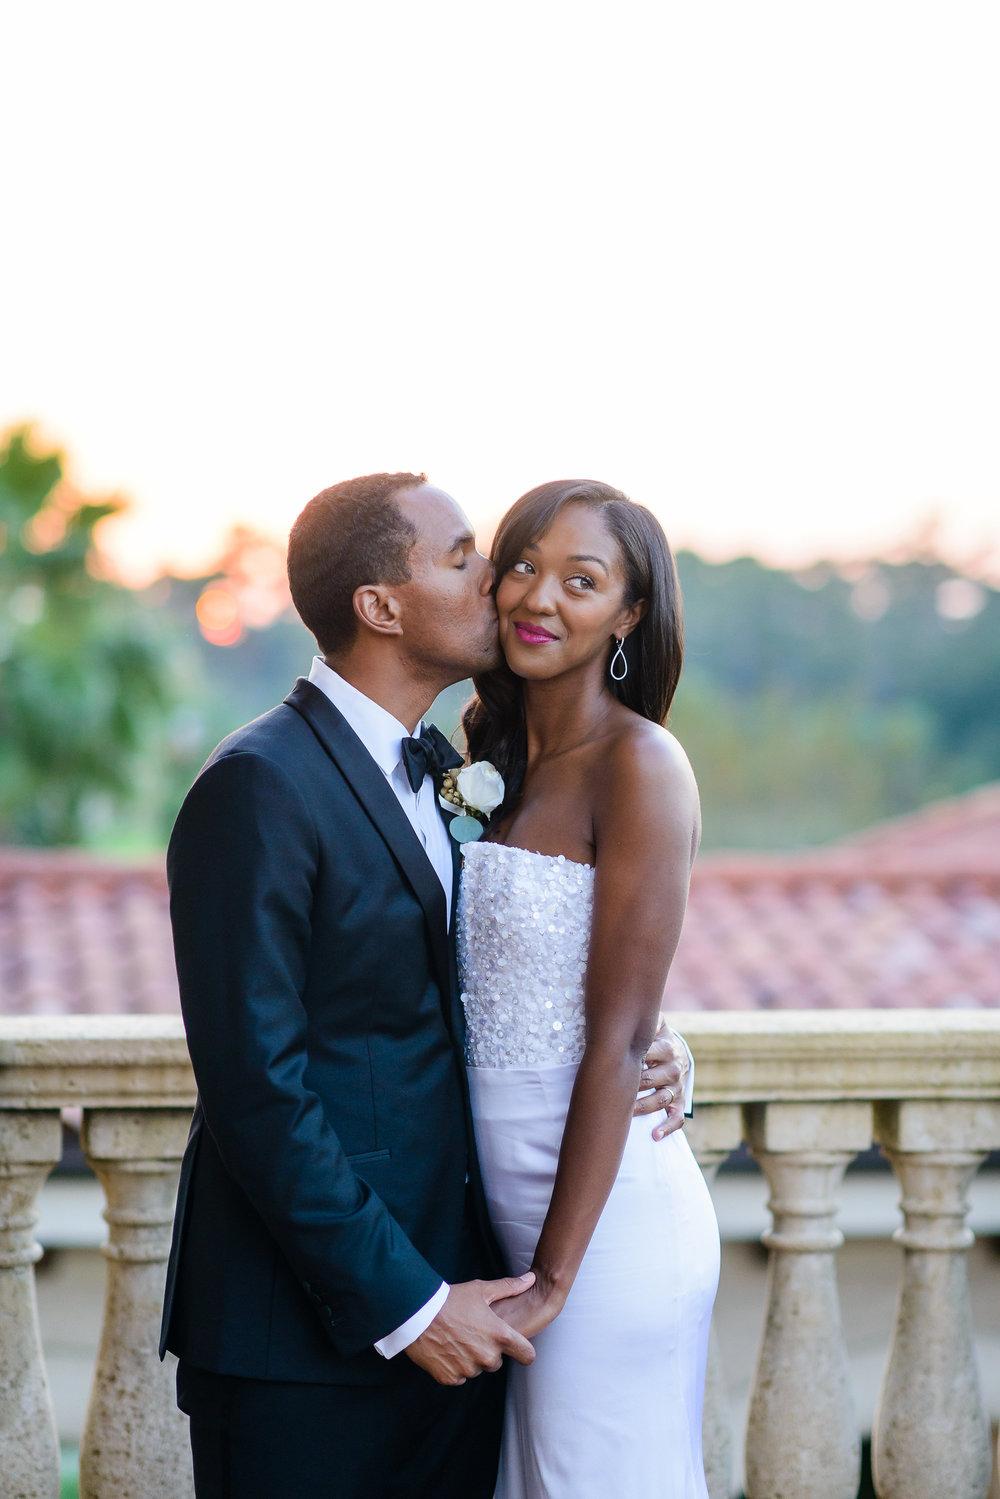 Amanda & Landon Raulerson-The Veil Wedding photography